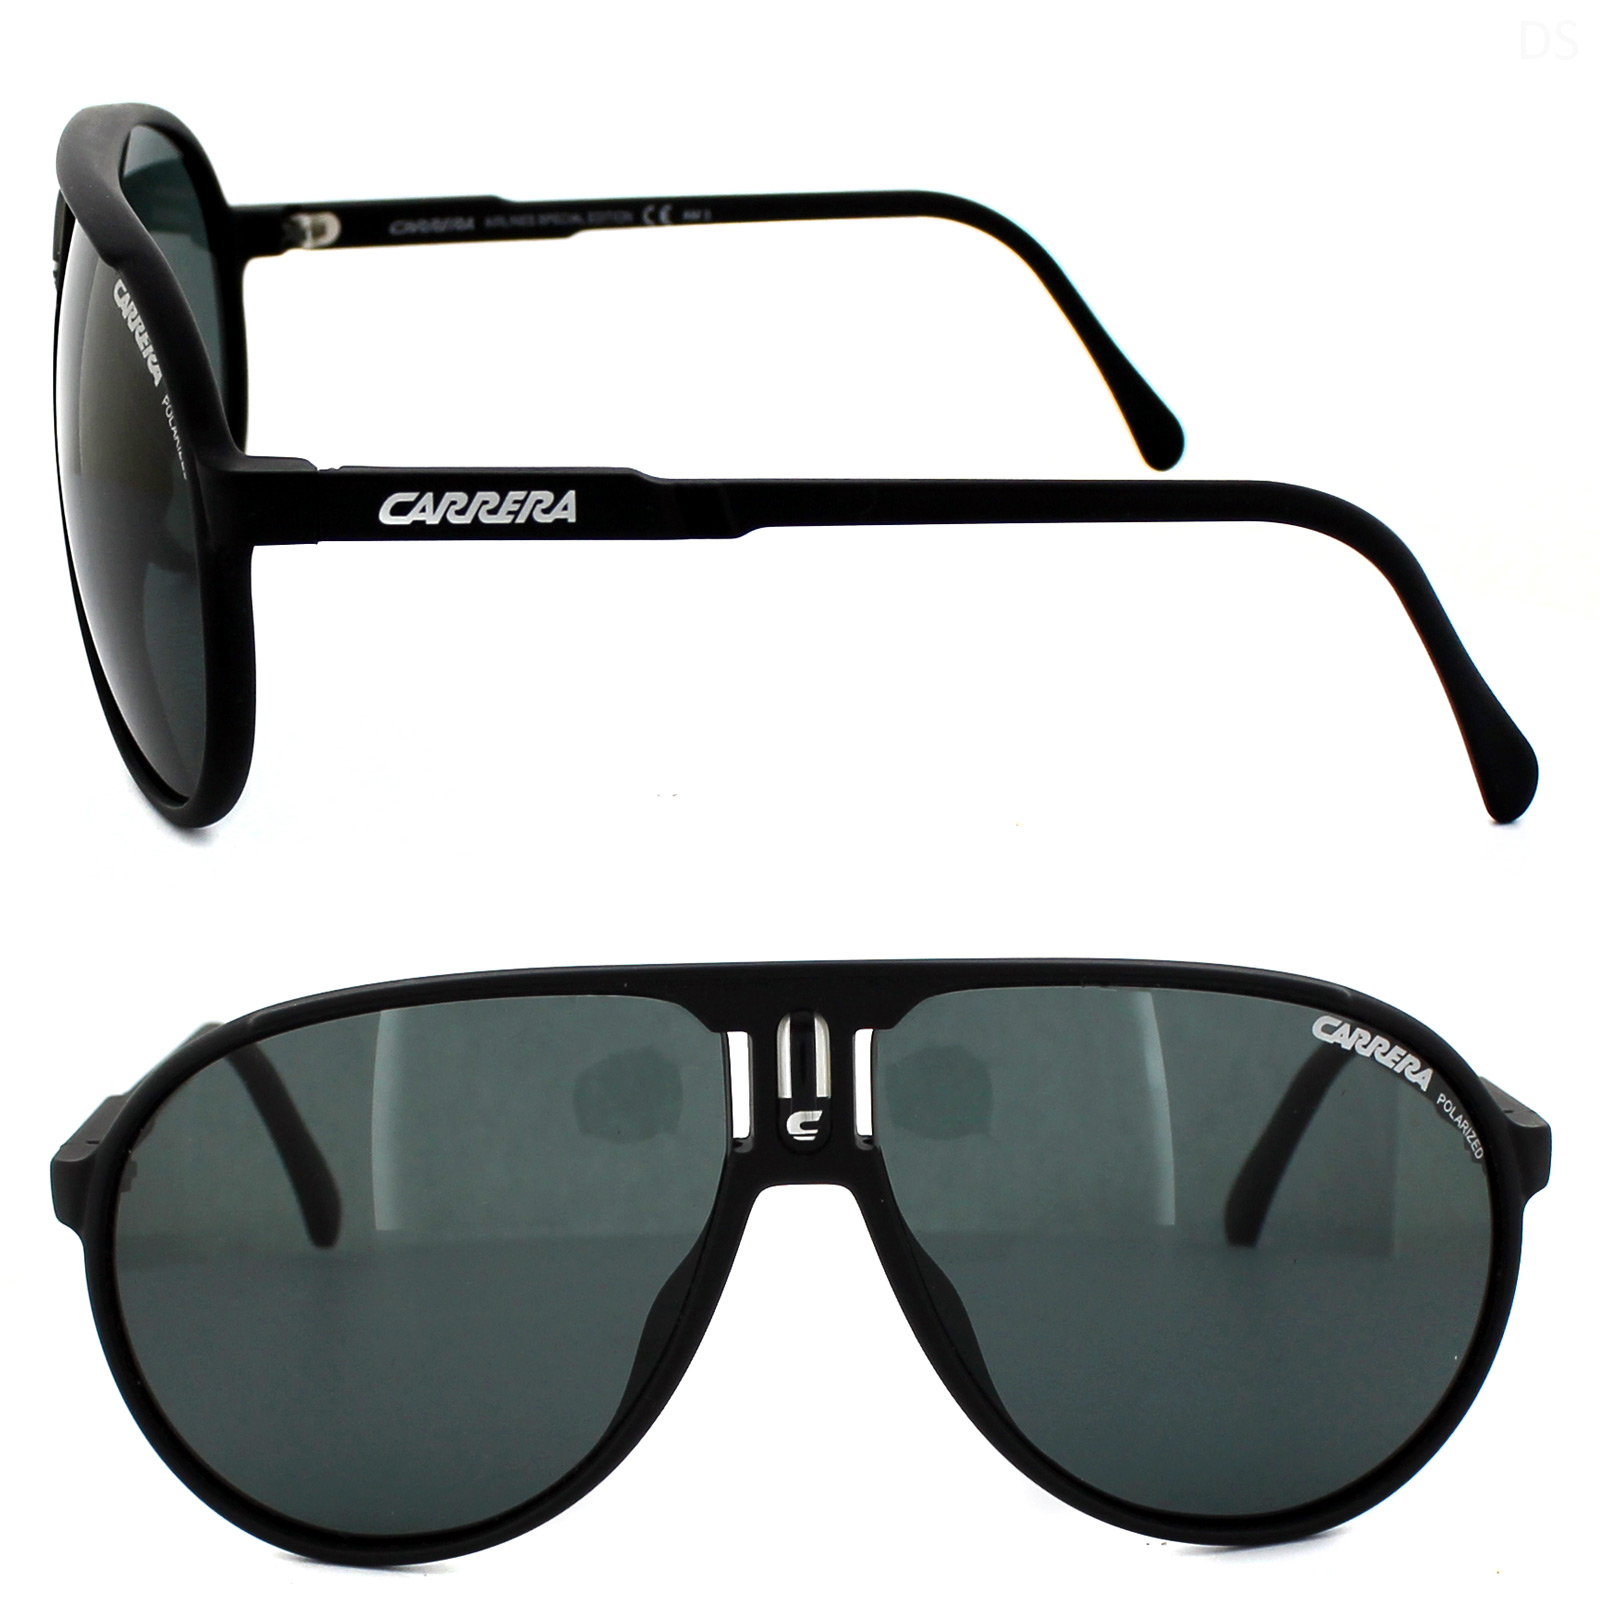 2af486bc61 Carrera Champion Sunglasses Polarized « Heritage Malta